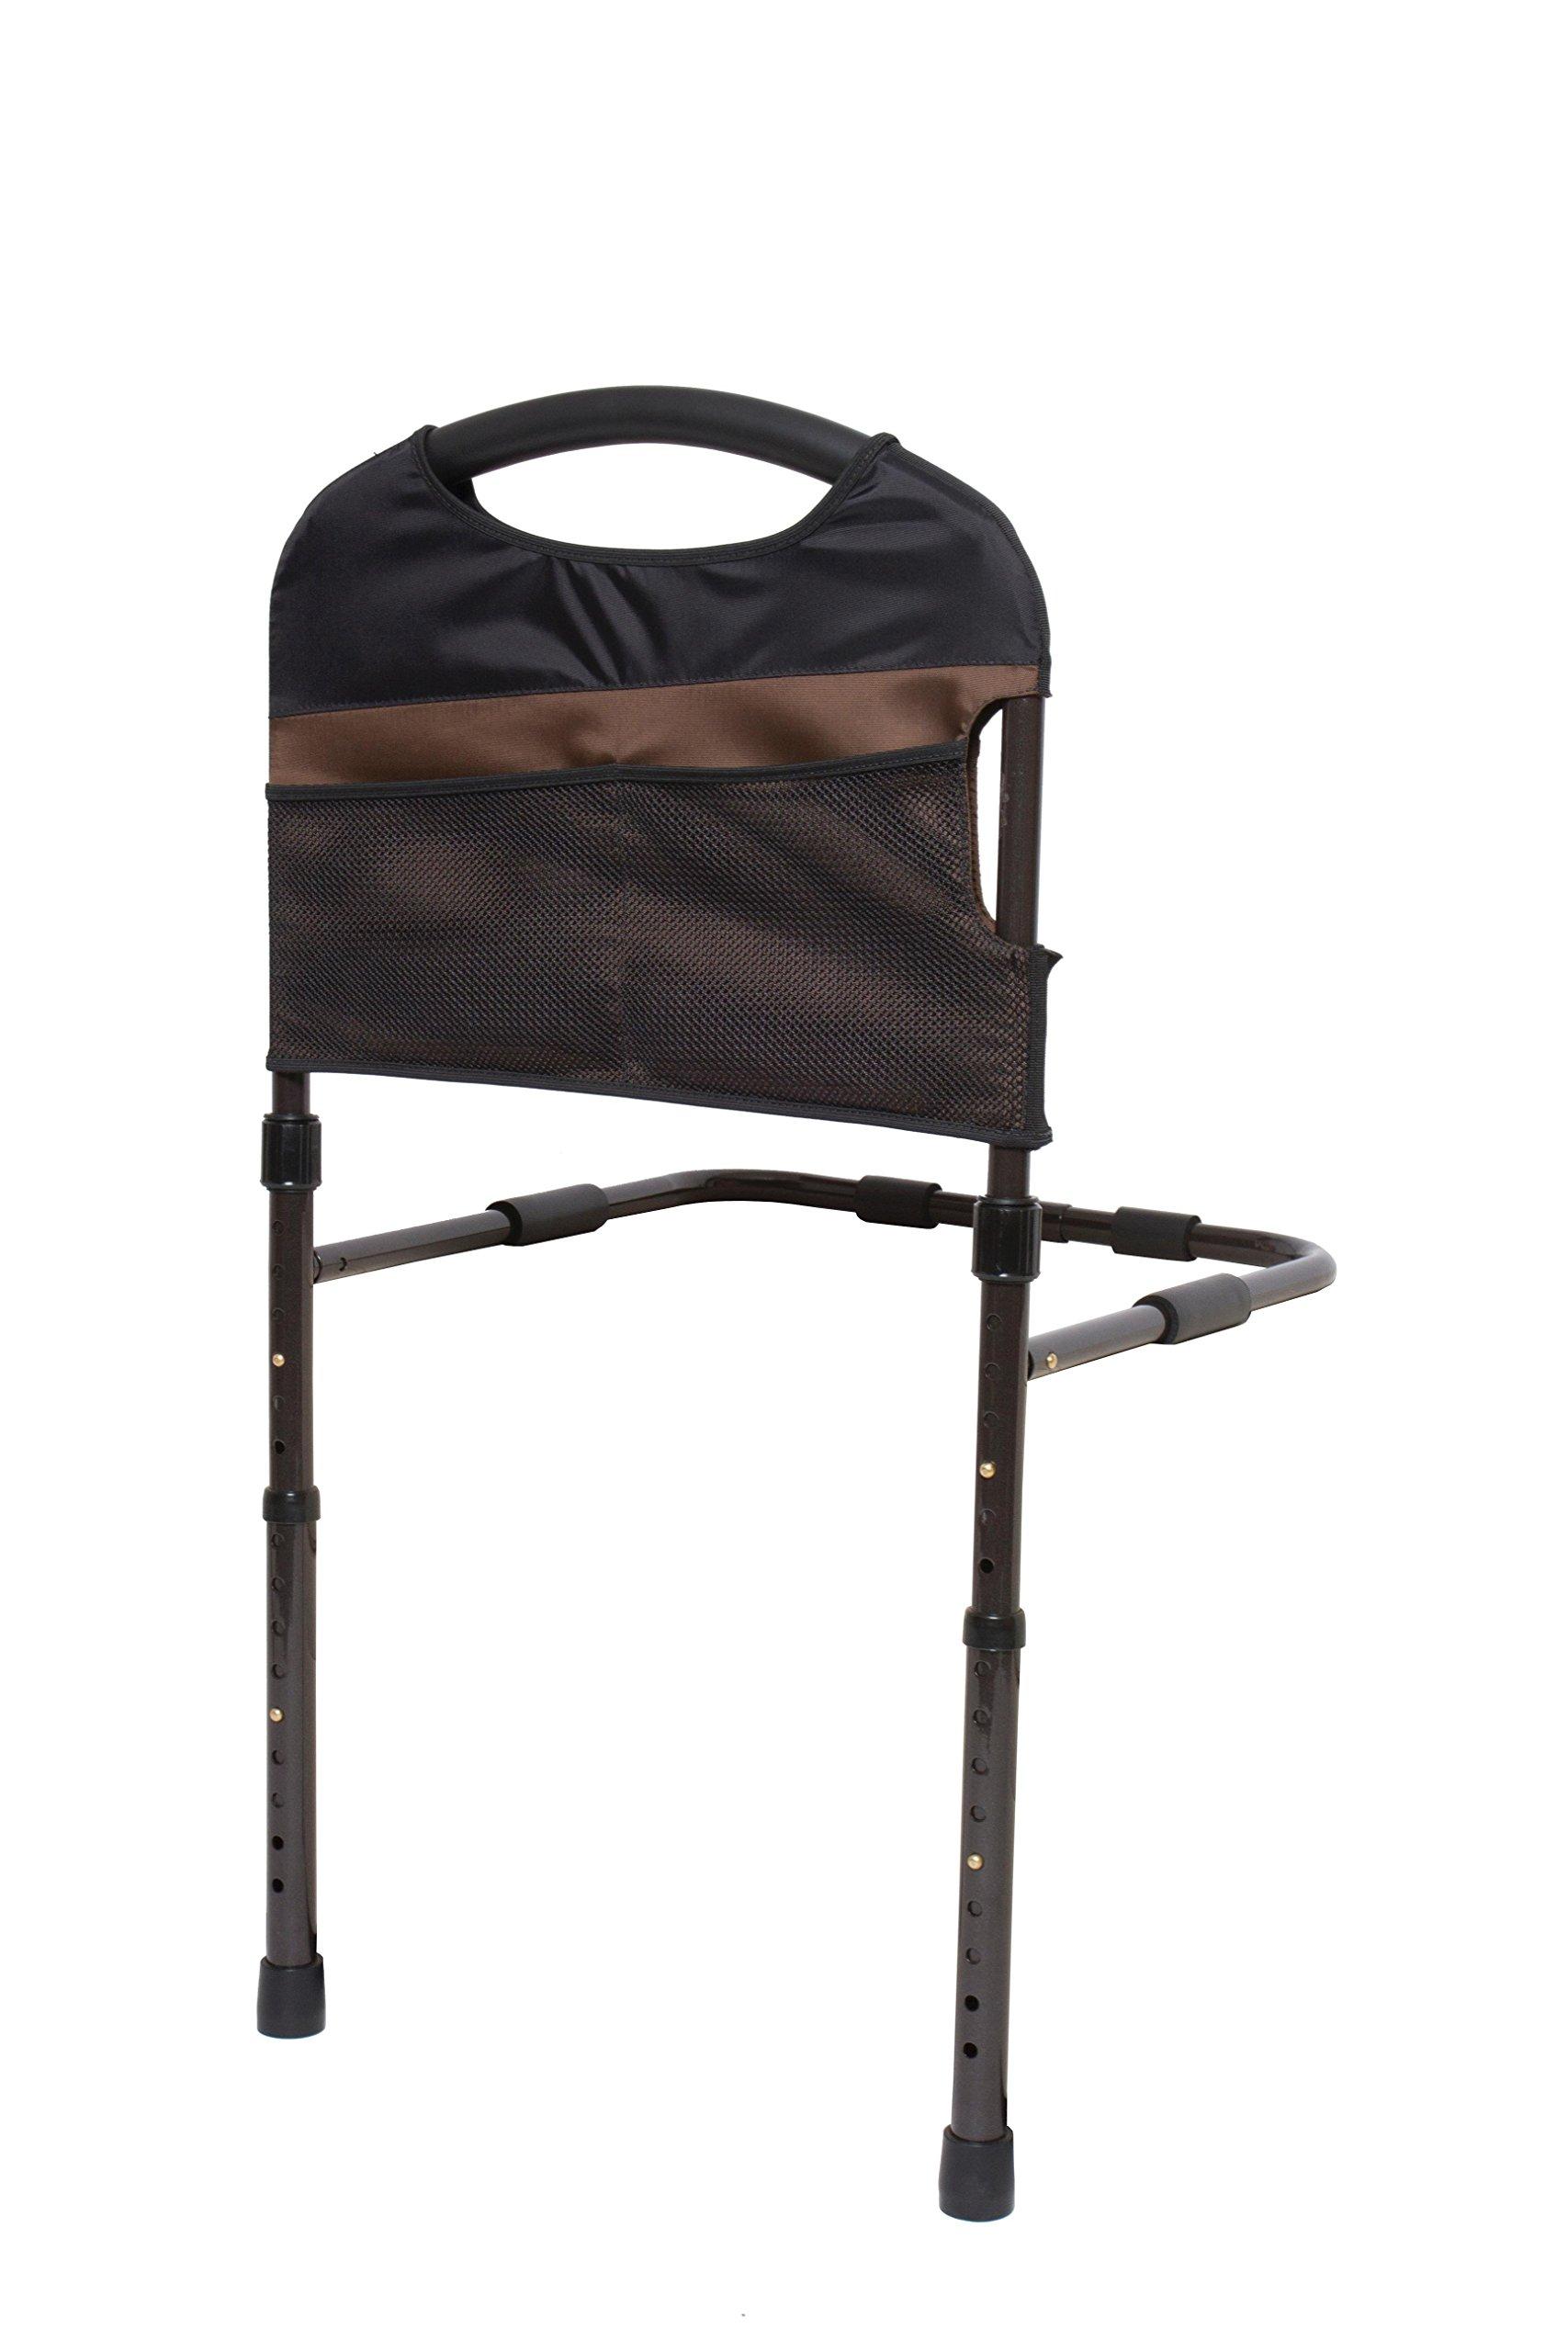 base metal bed size frames of sale full rails for headboard elderly with king white leirsund platform frame ikea